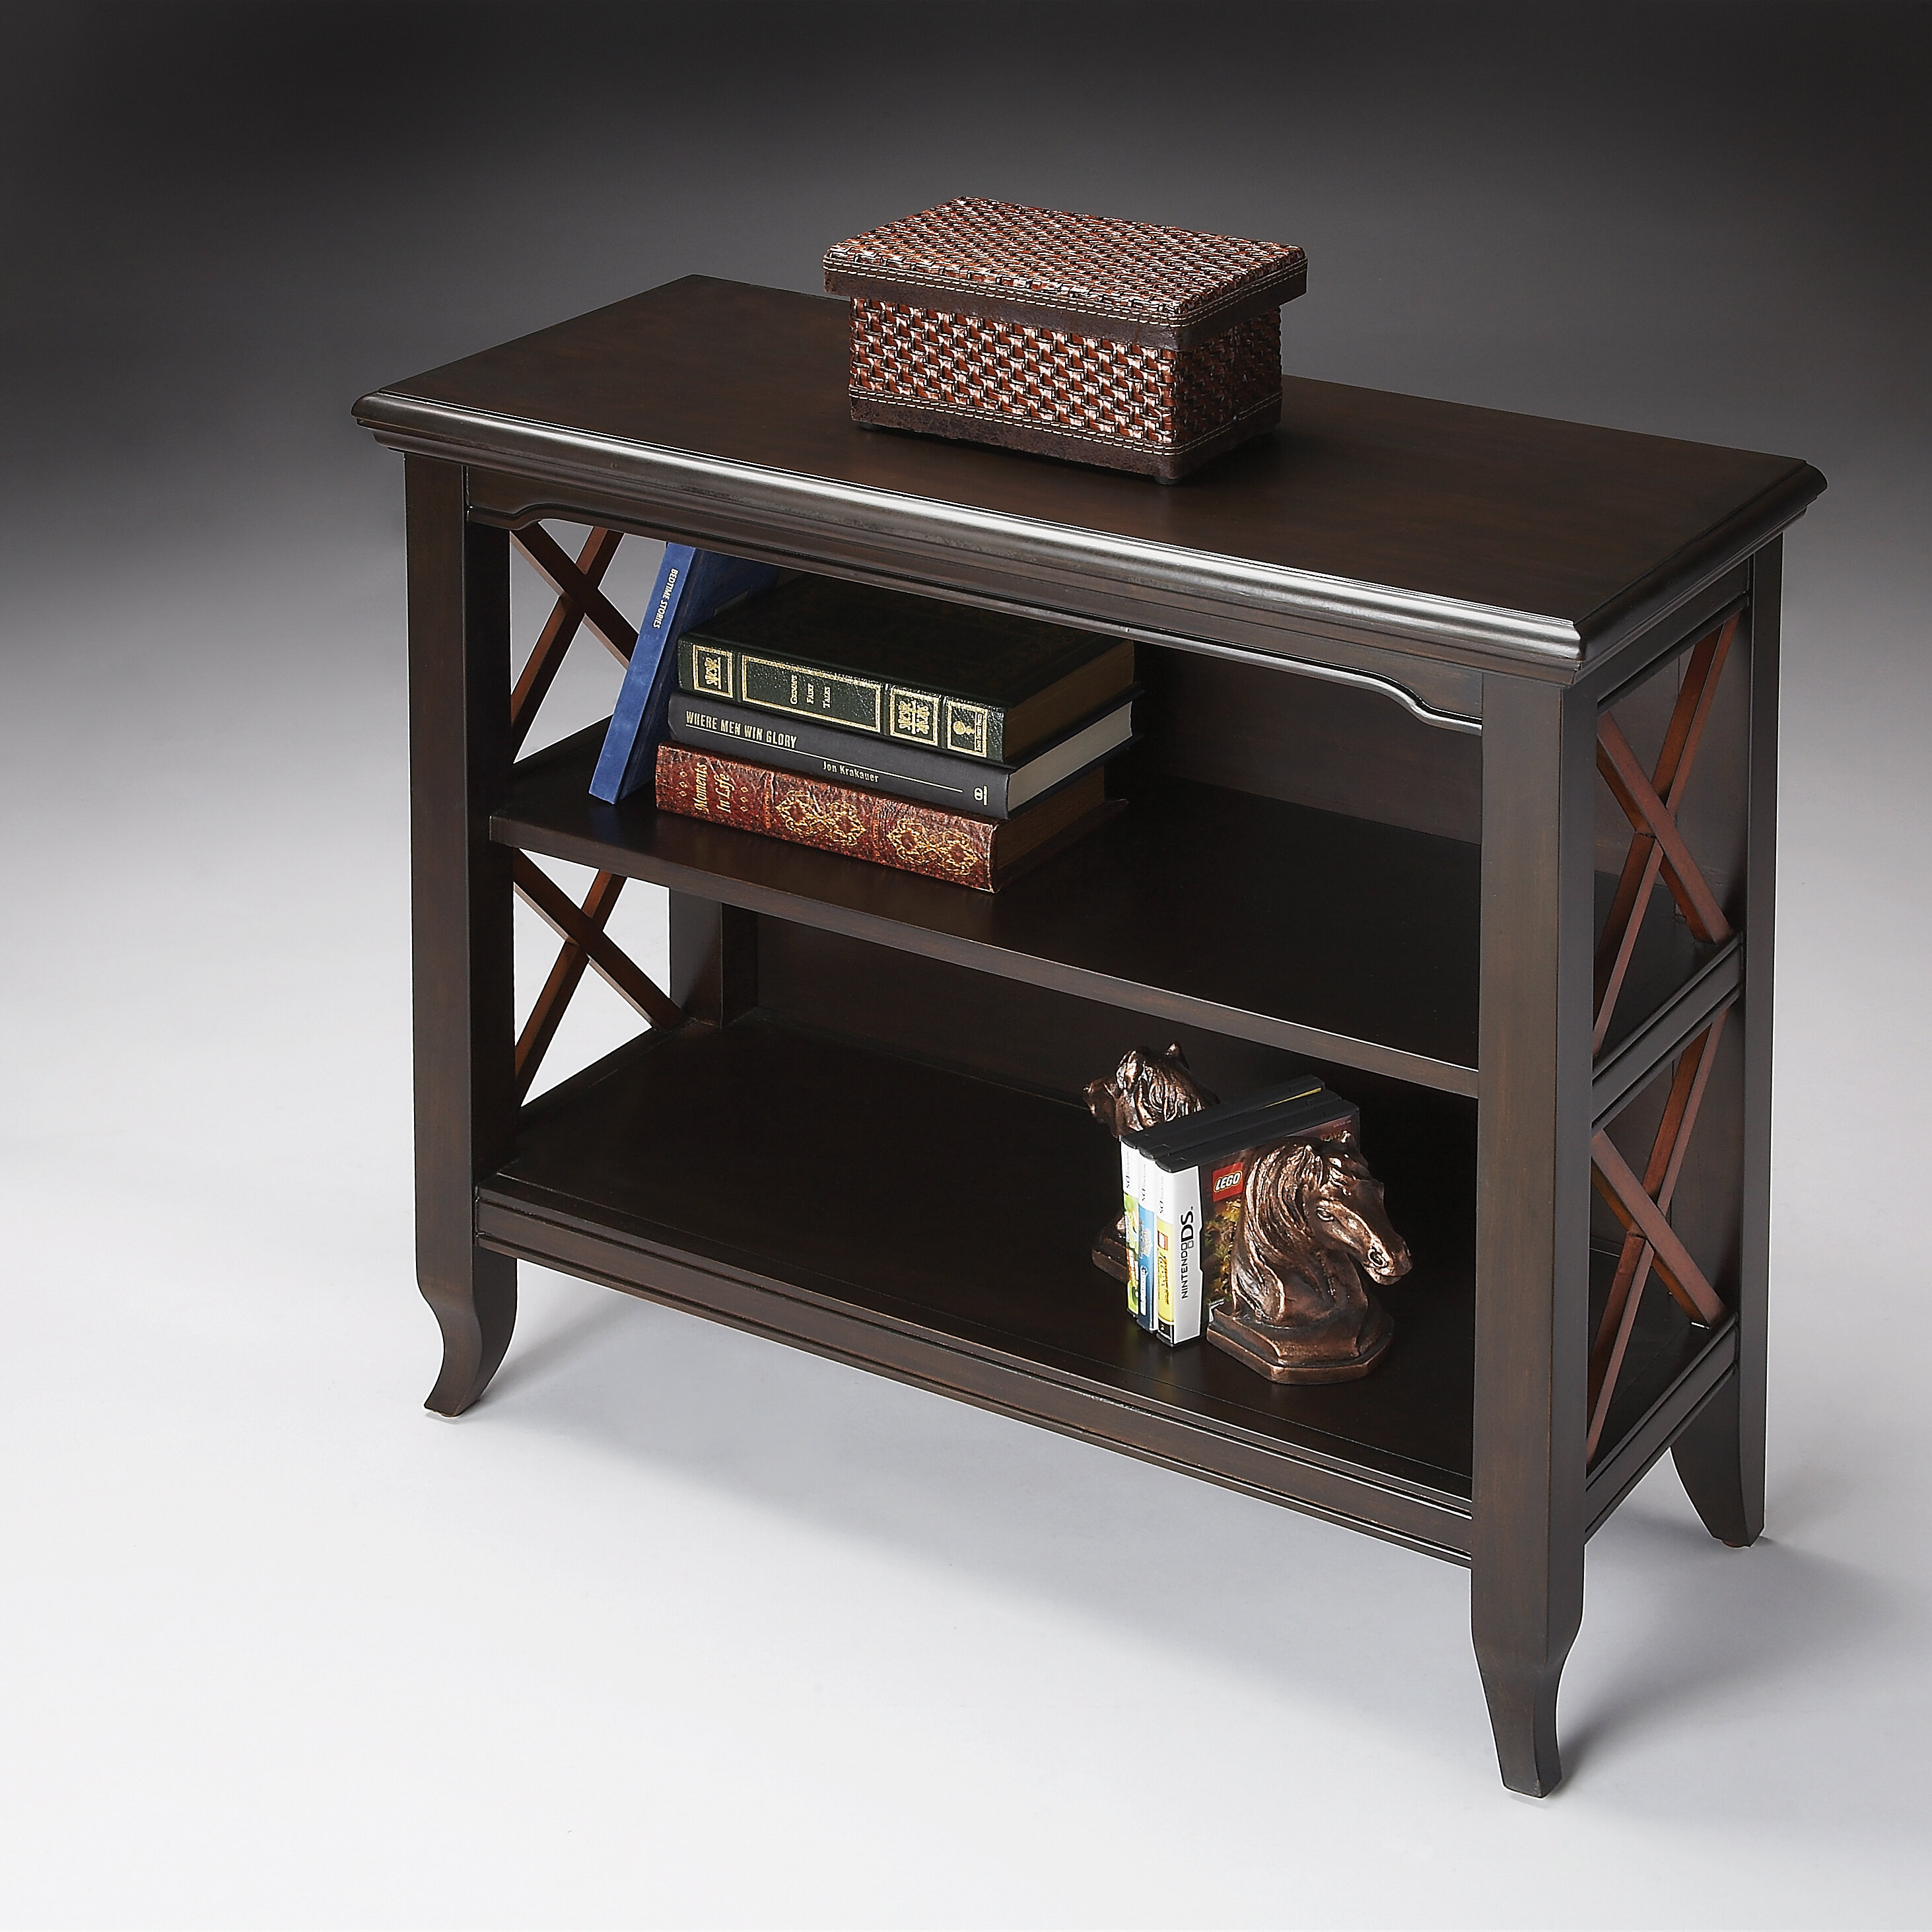 Pennville Standard Bookcase